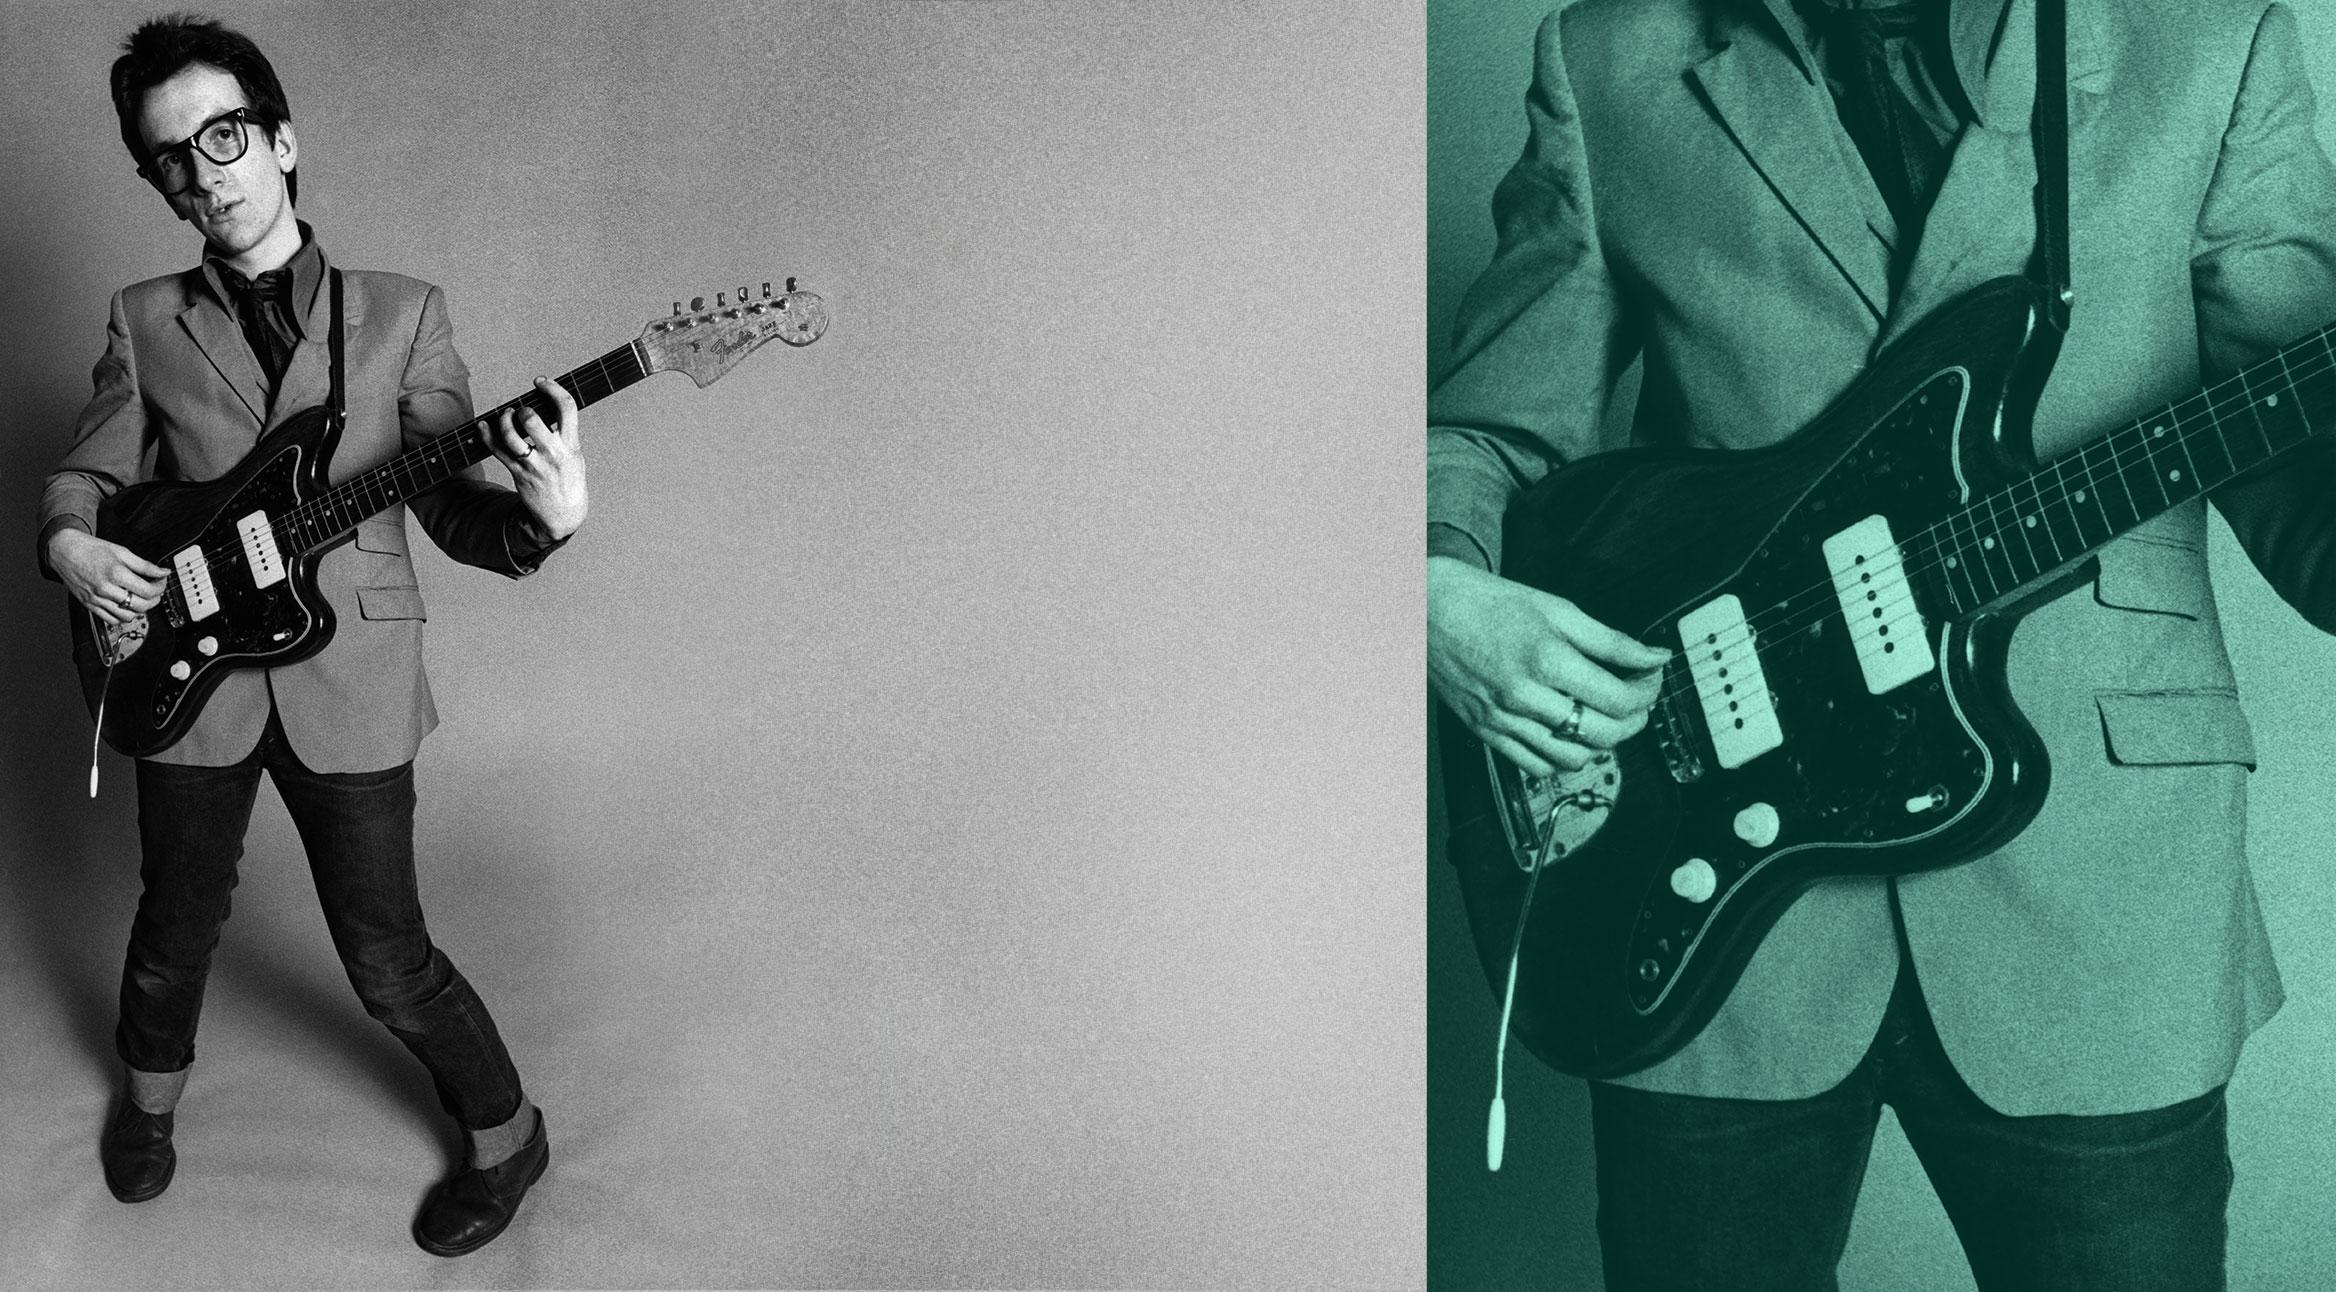 History of the Fender Jazzmaster | Fender Guitars